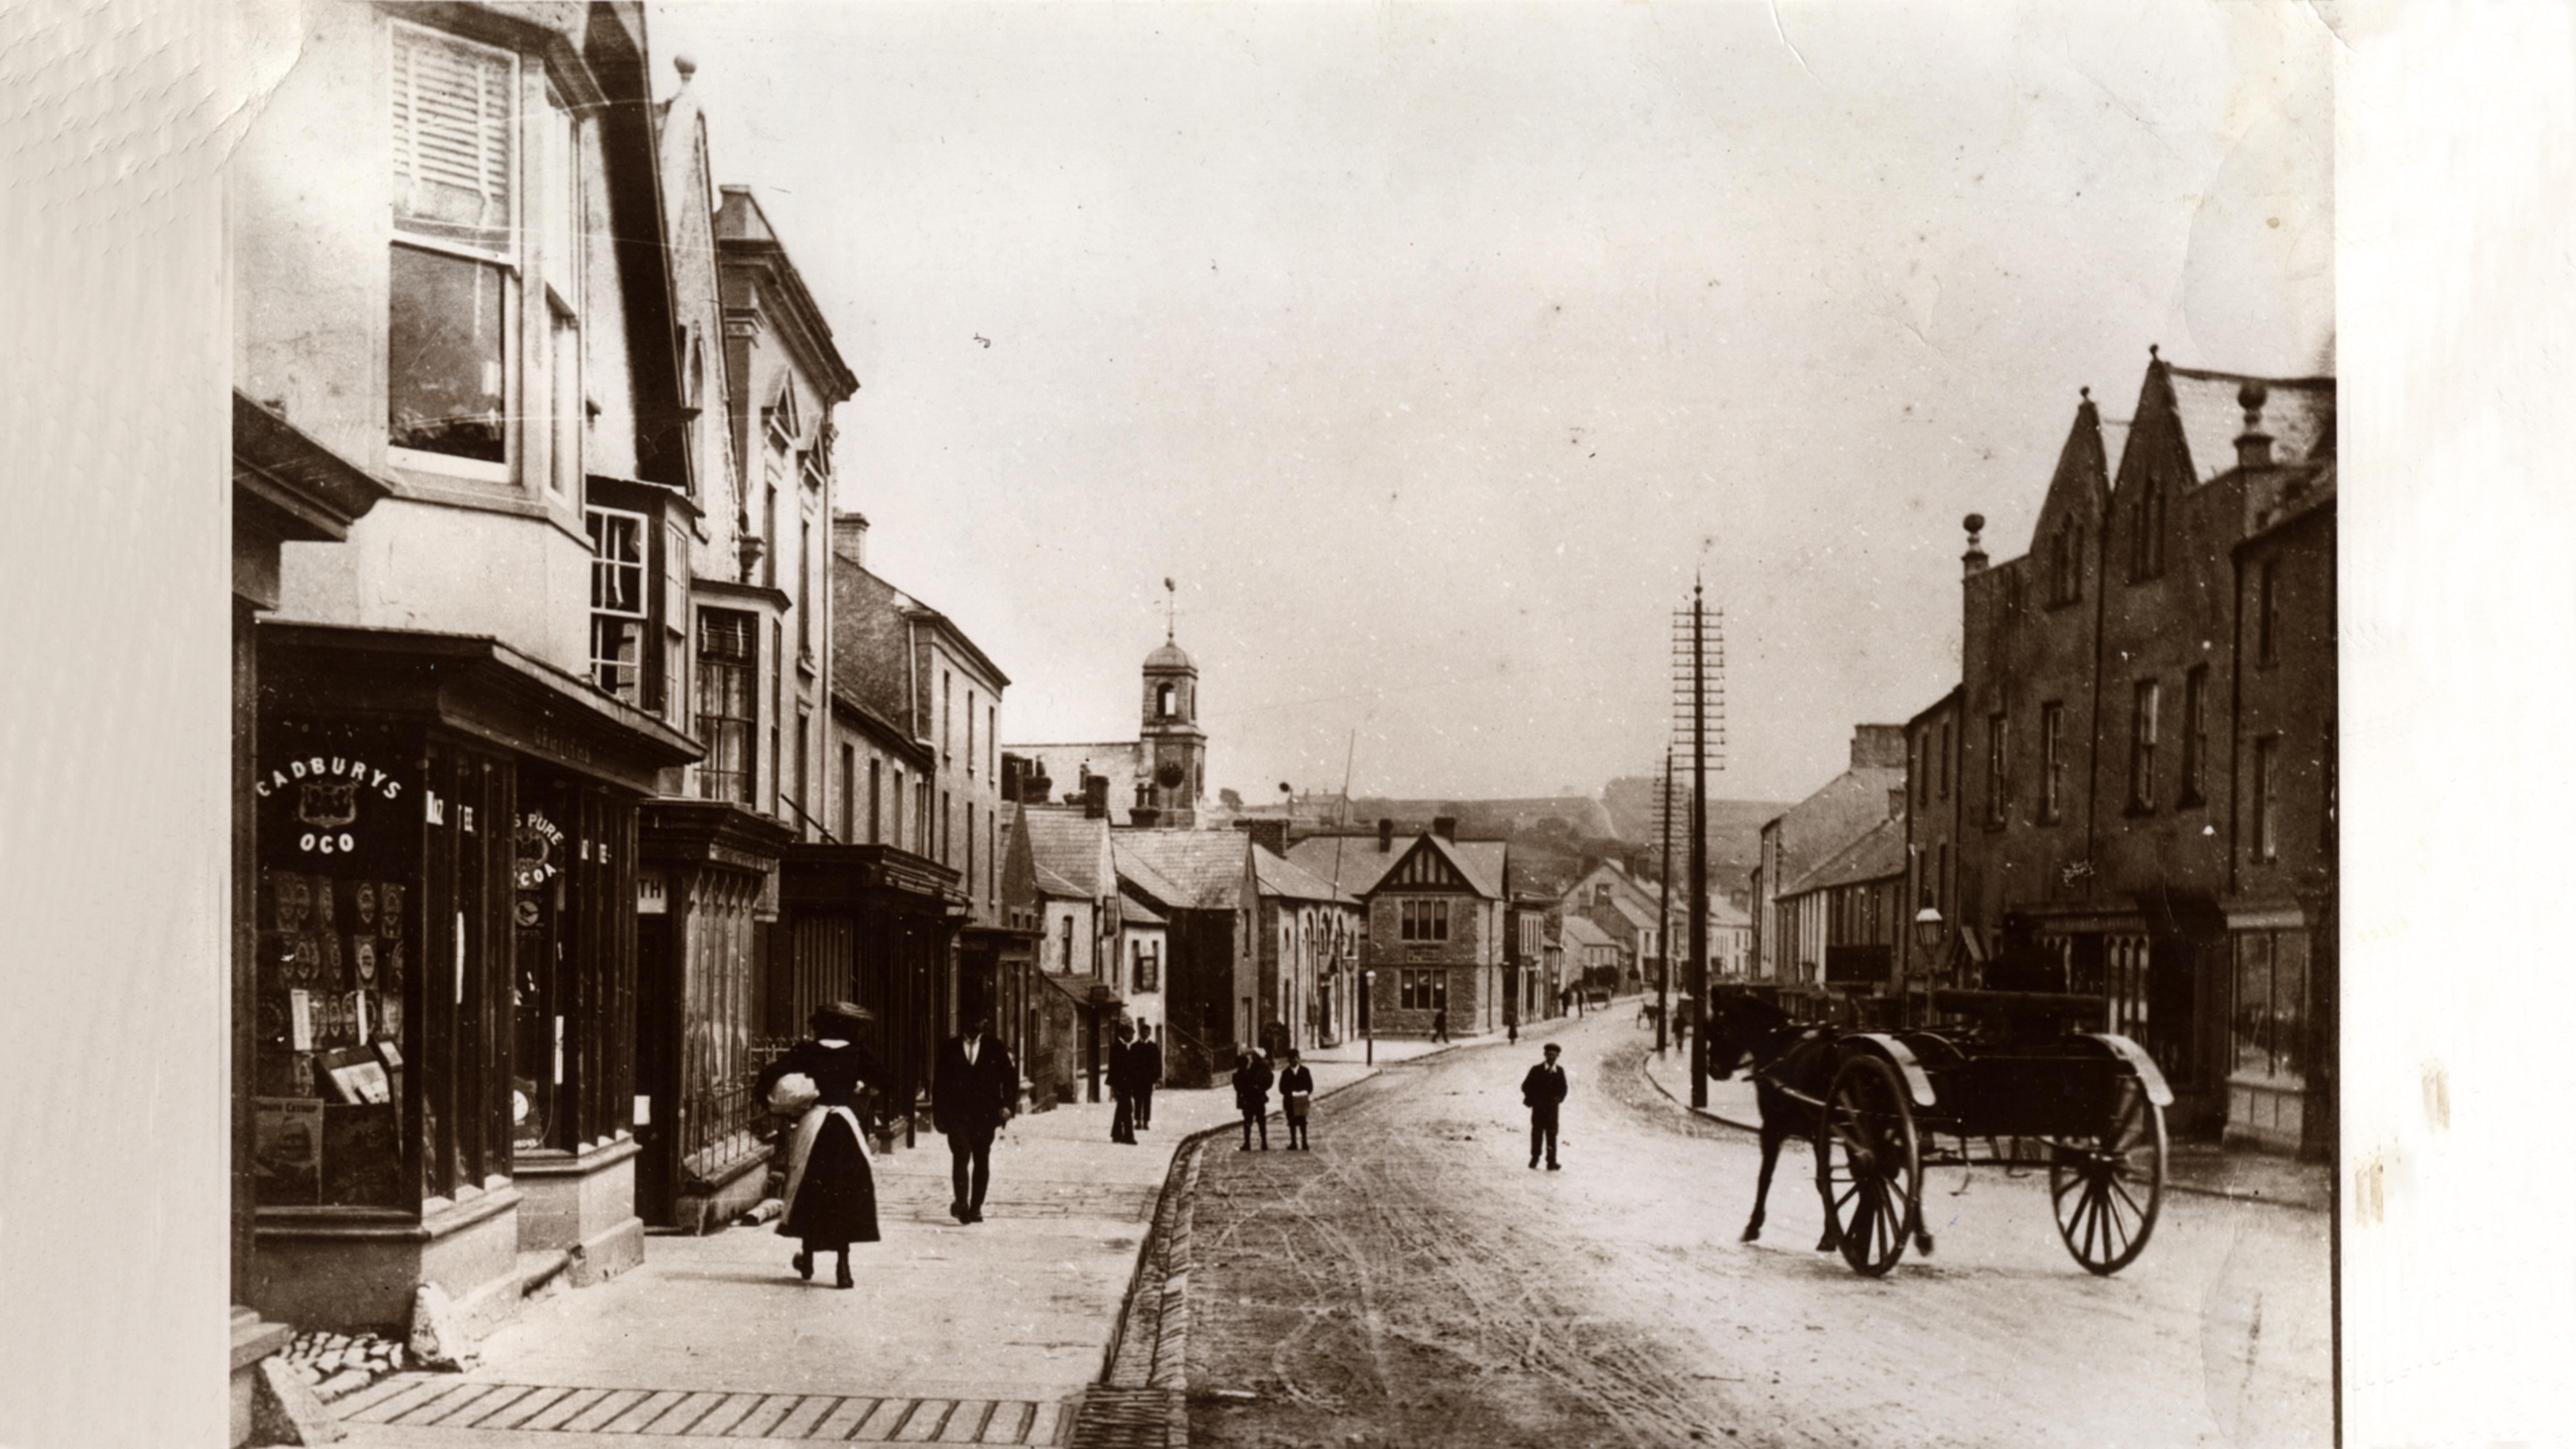 Historic Image of 39 High Street